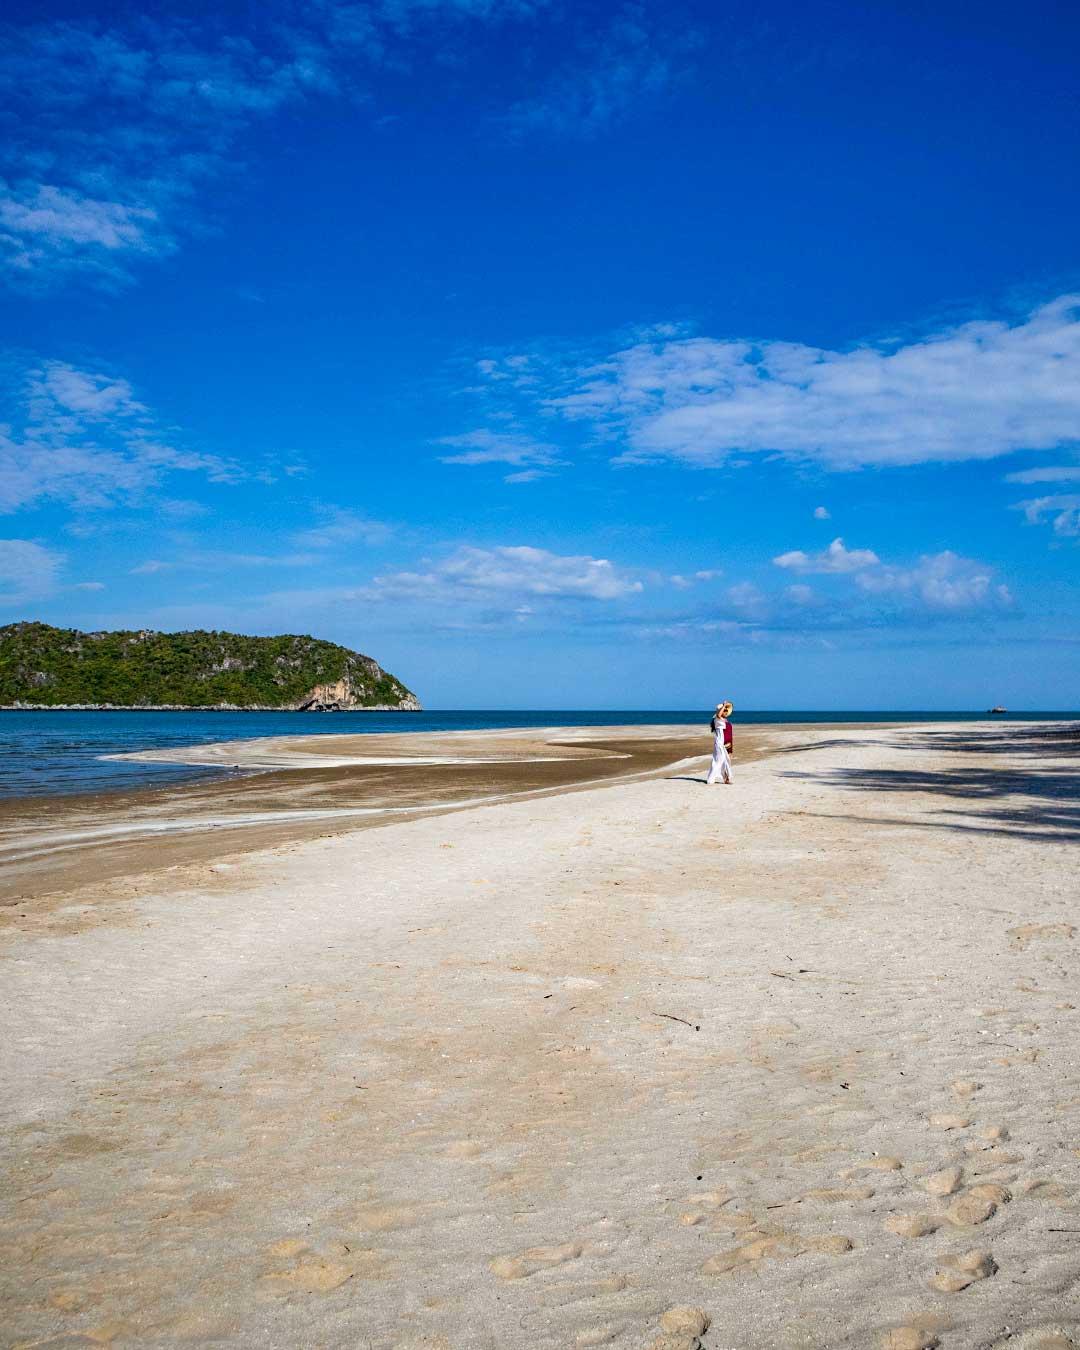 Laem-Sala-Beach-The-beach-Phraya-Nakhon-Cave